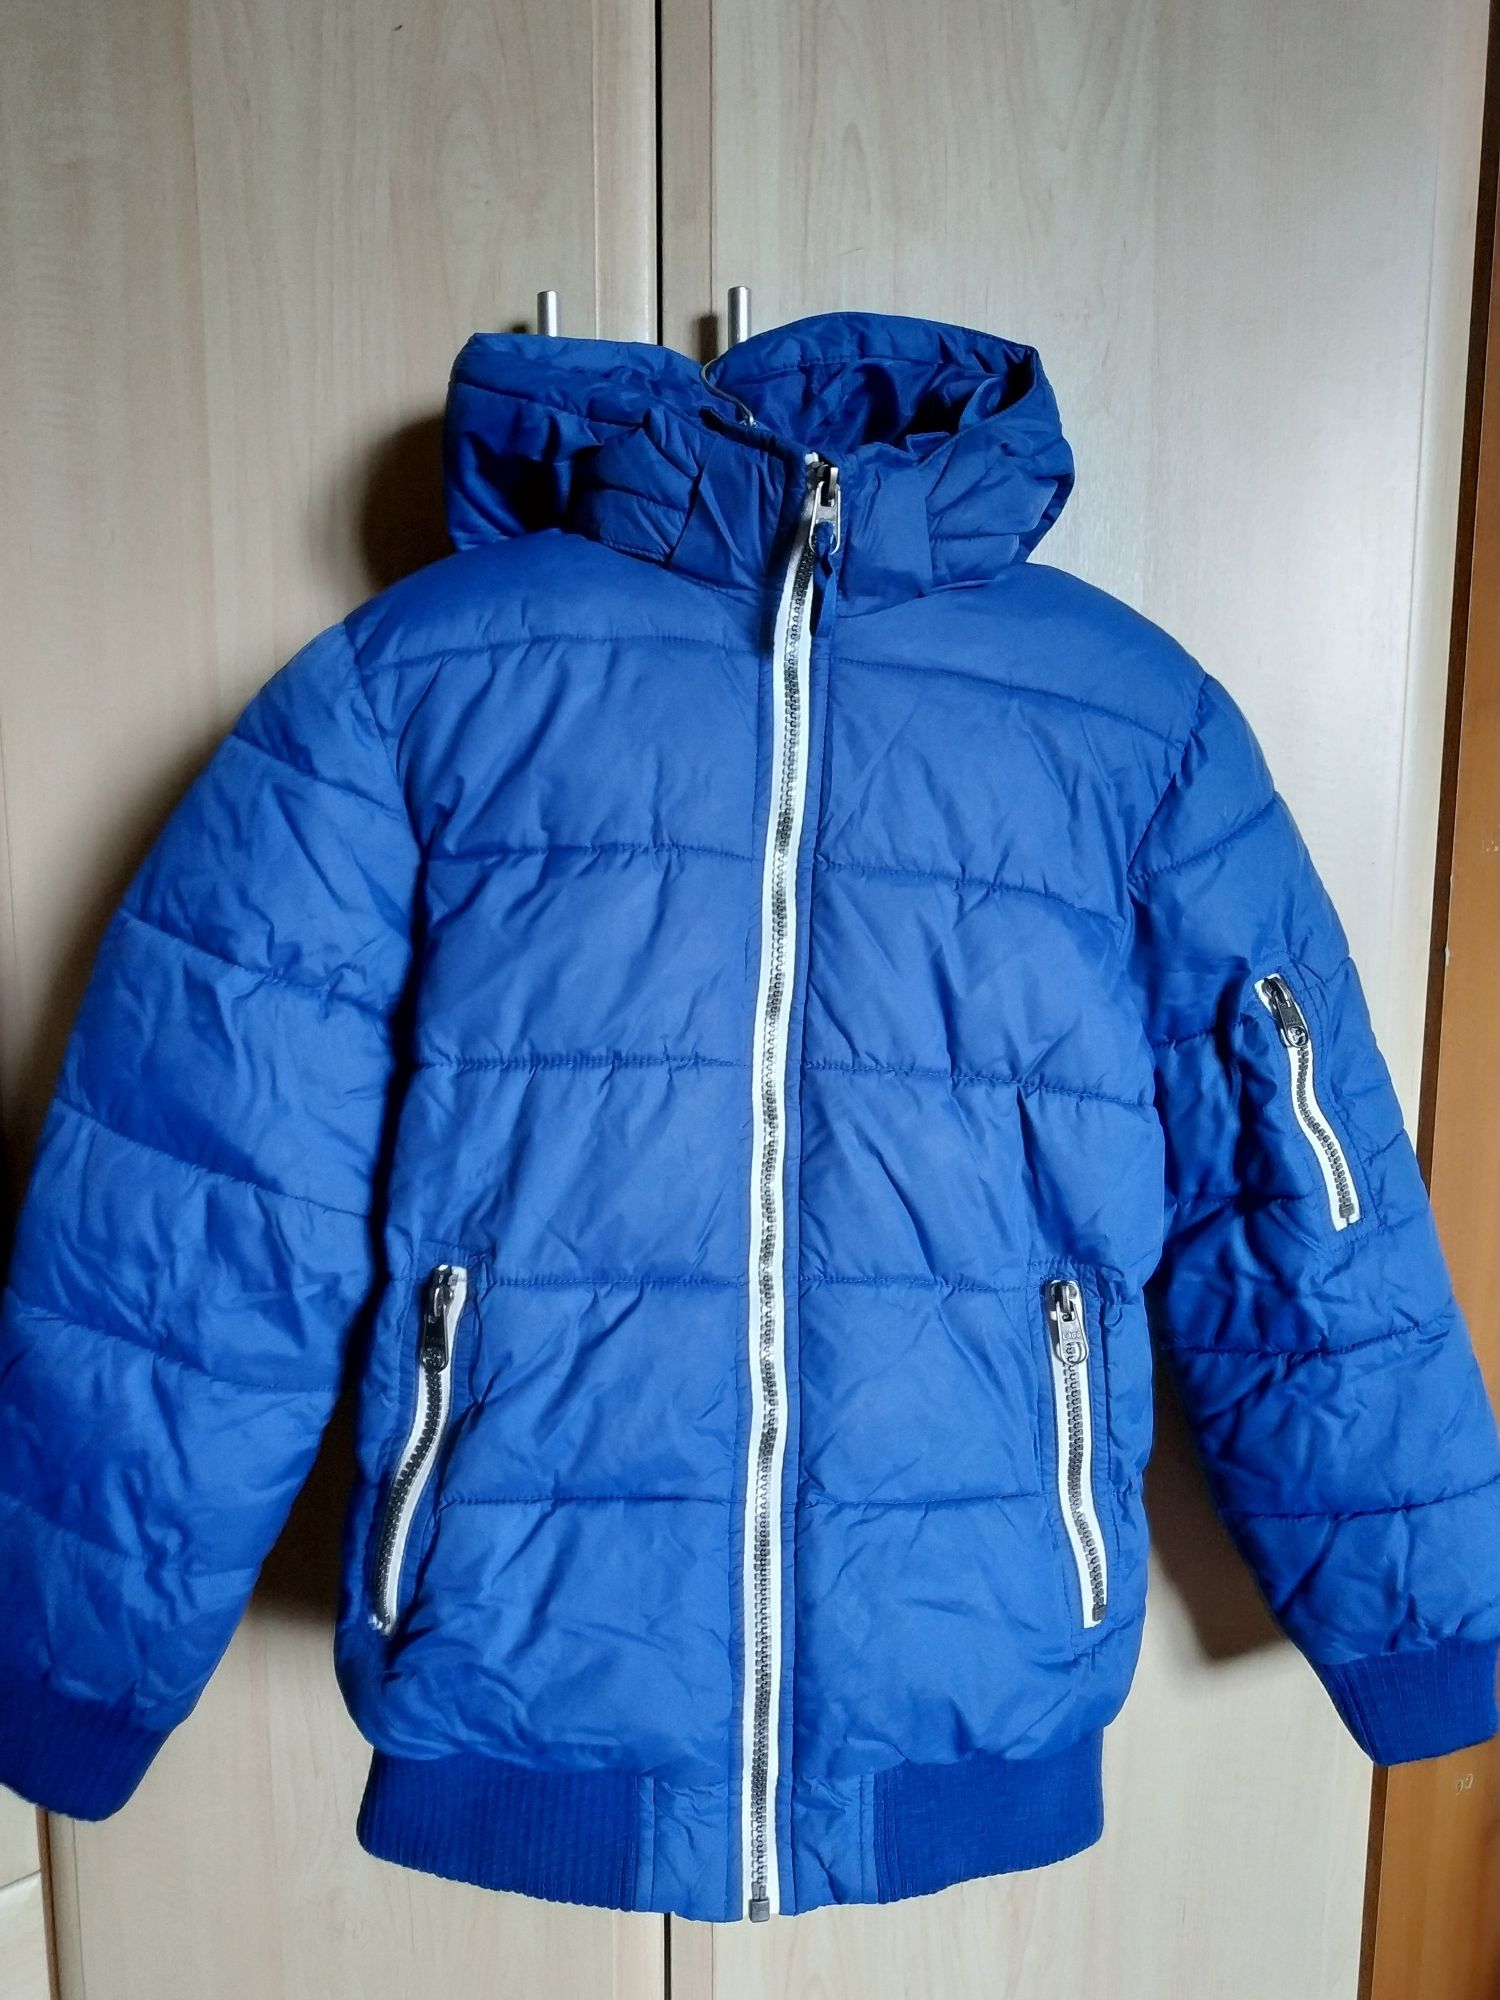 Стильная демисезонн куртка бренда HM L.O.G.G. На рост 146